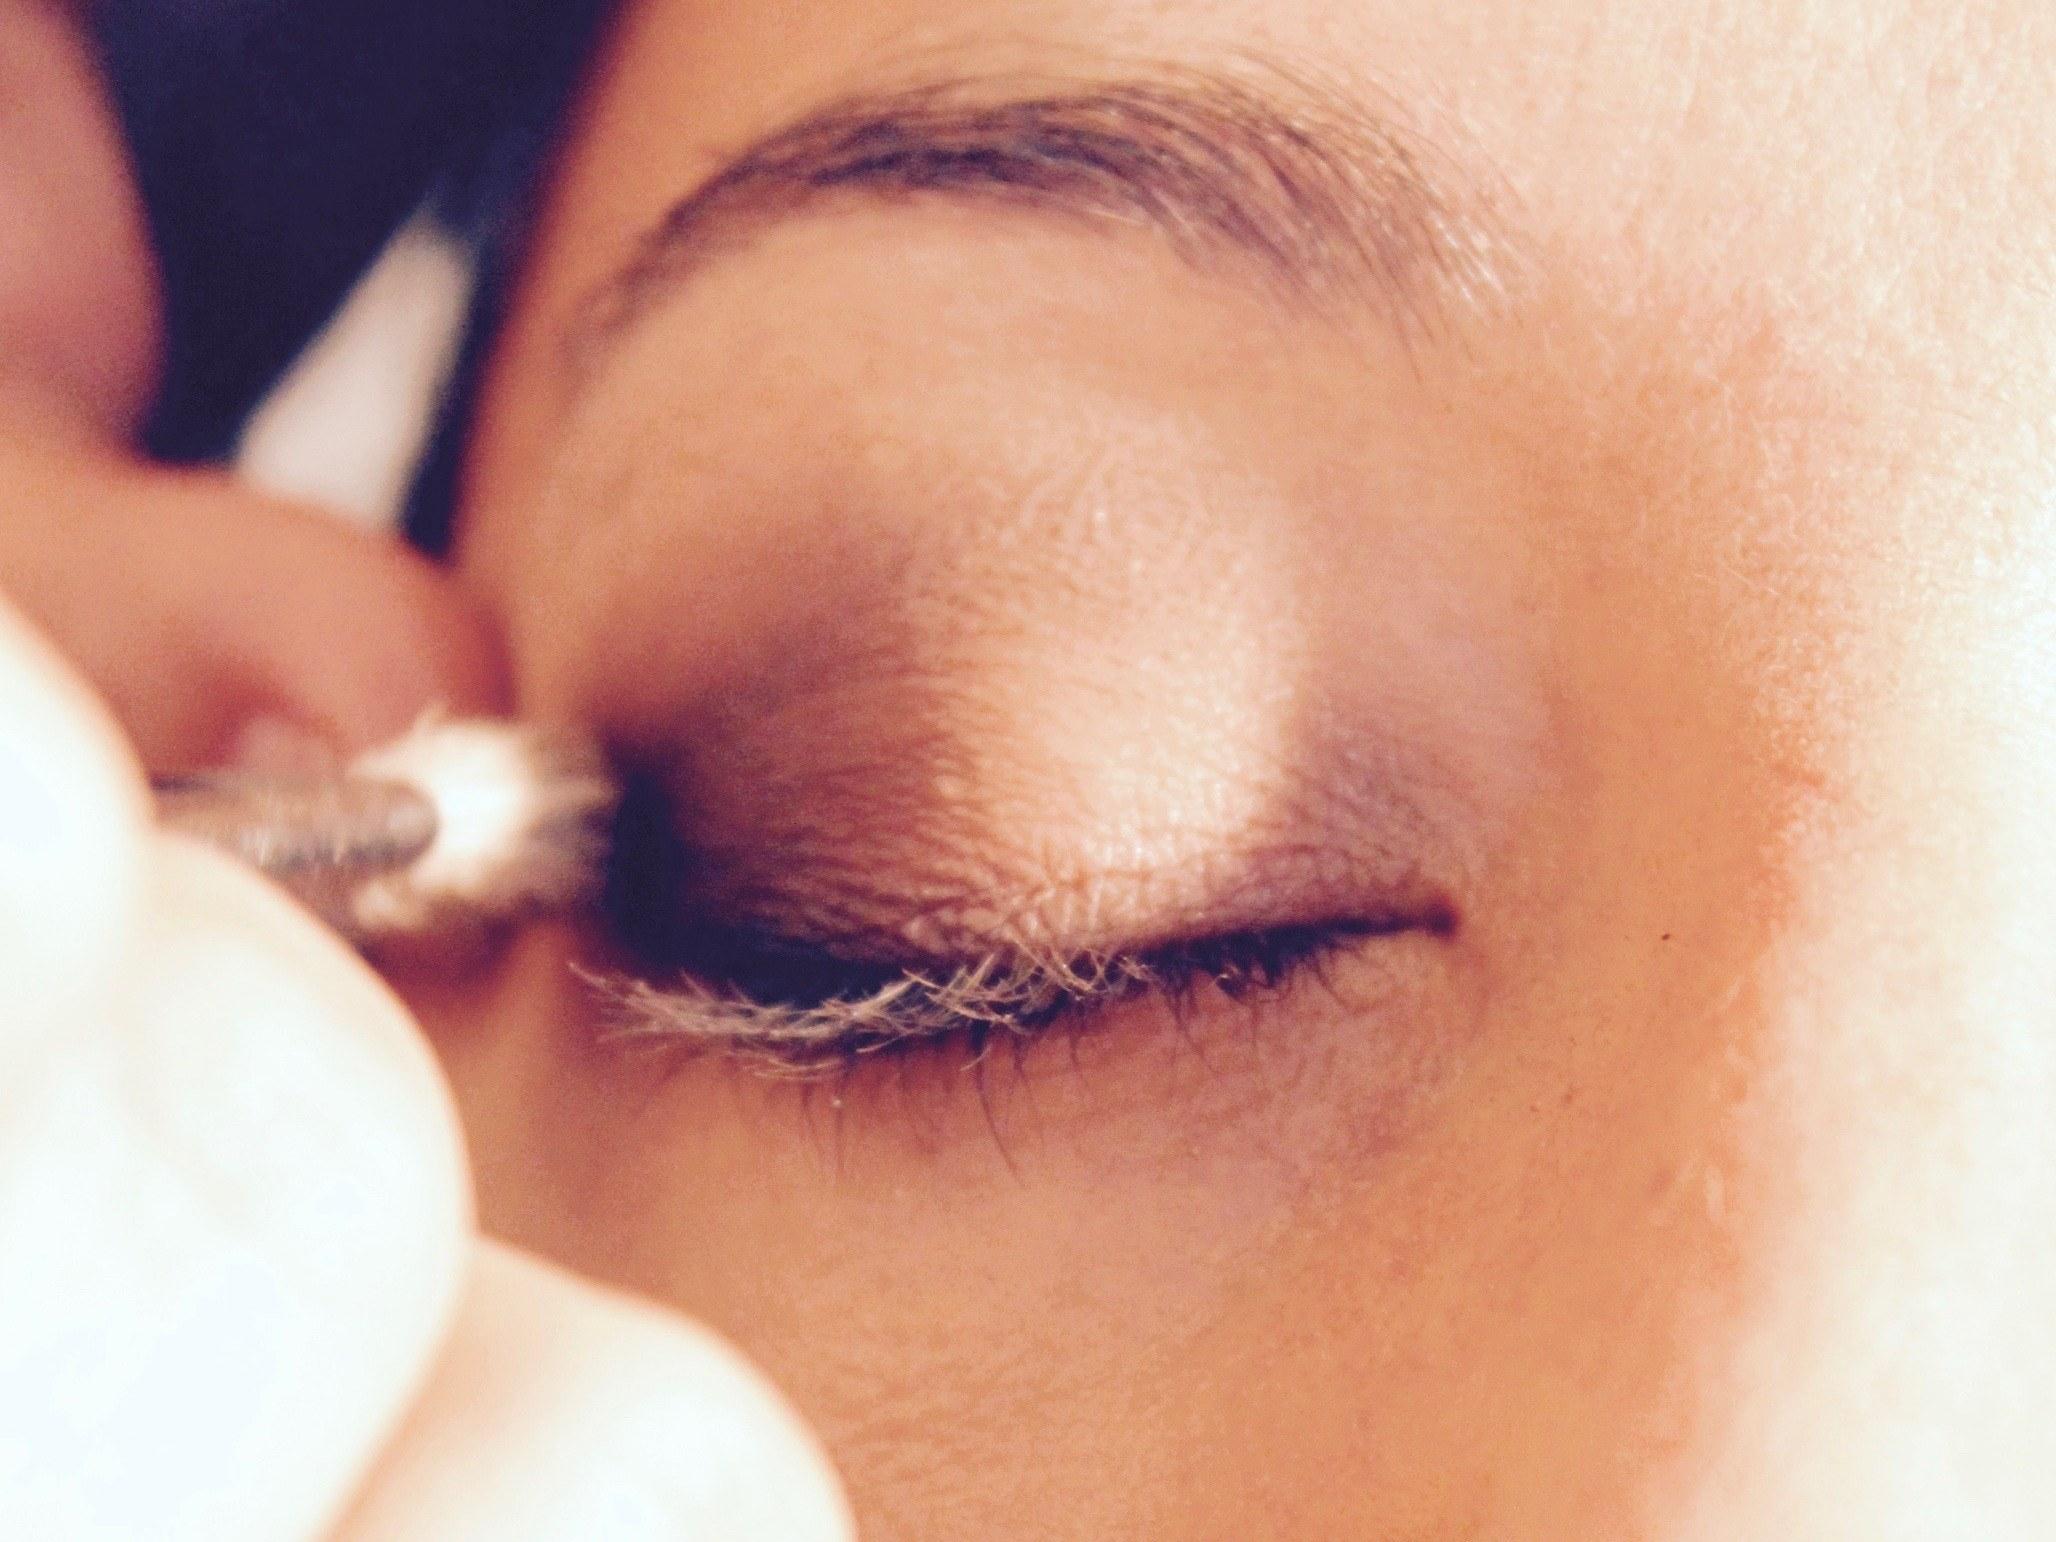 institut-de-beaute-lyon-oeil-maquillage